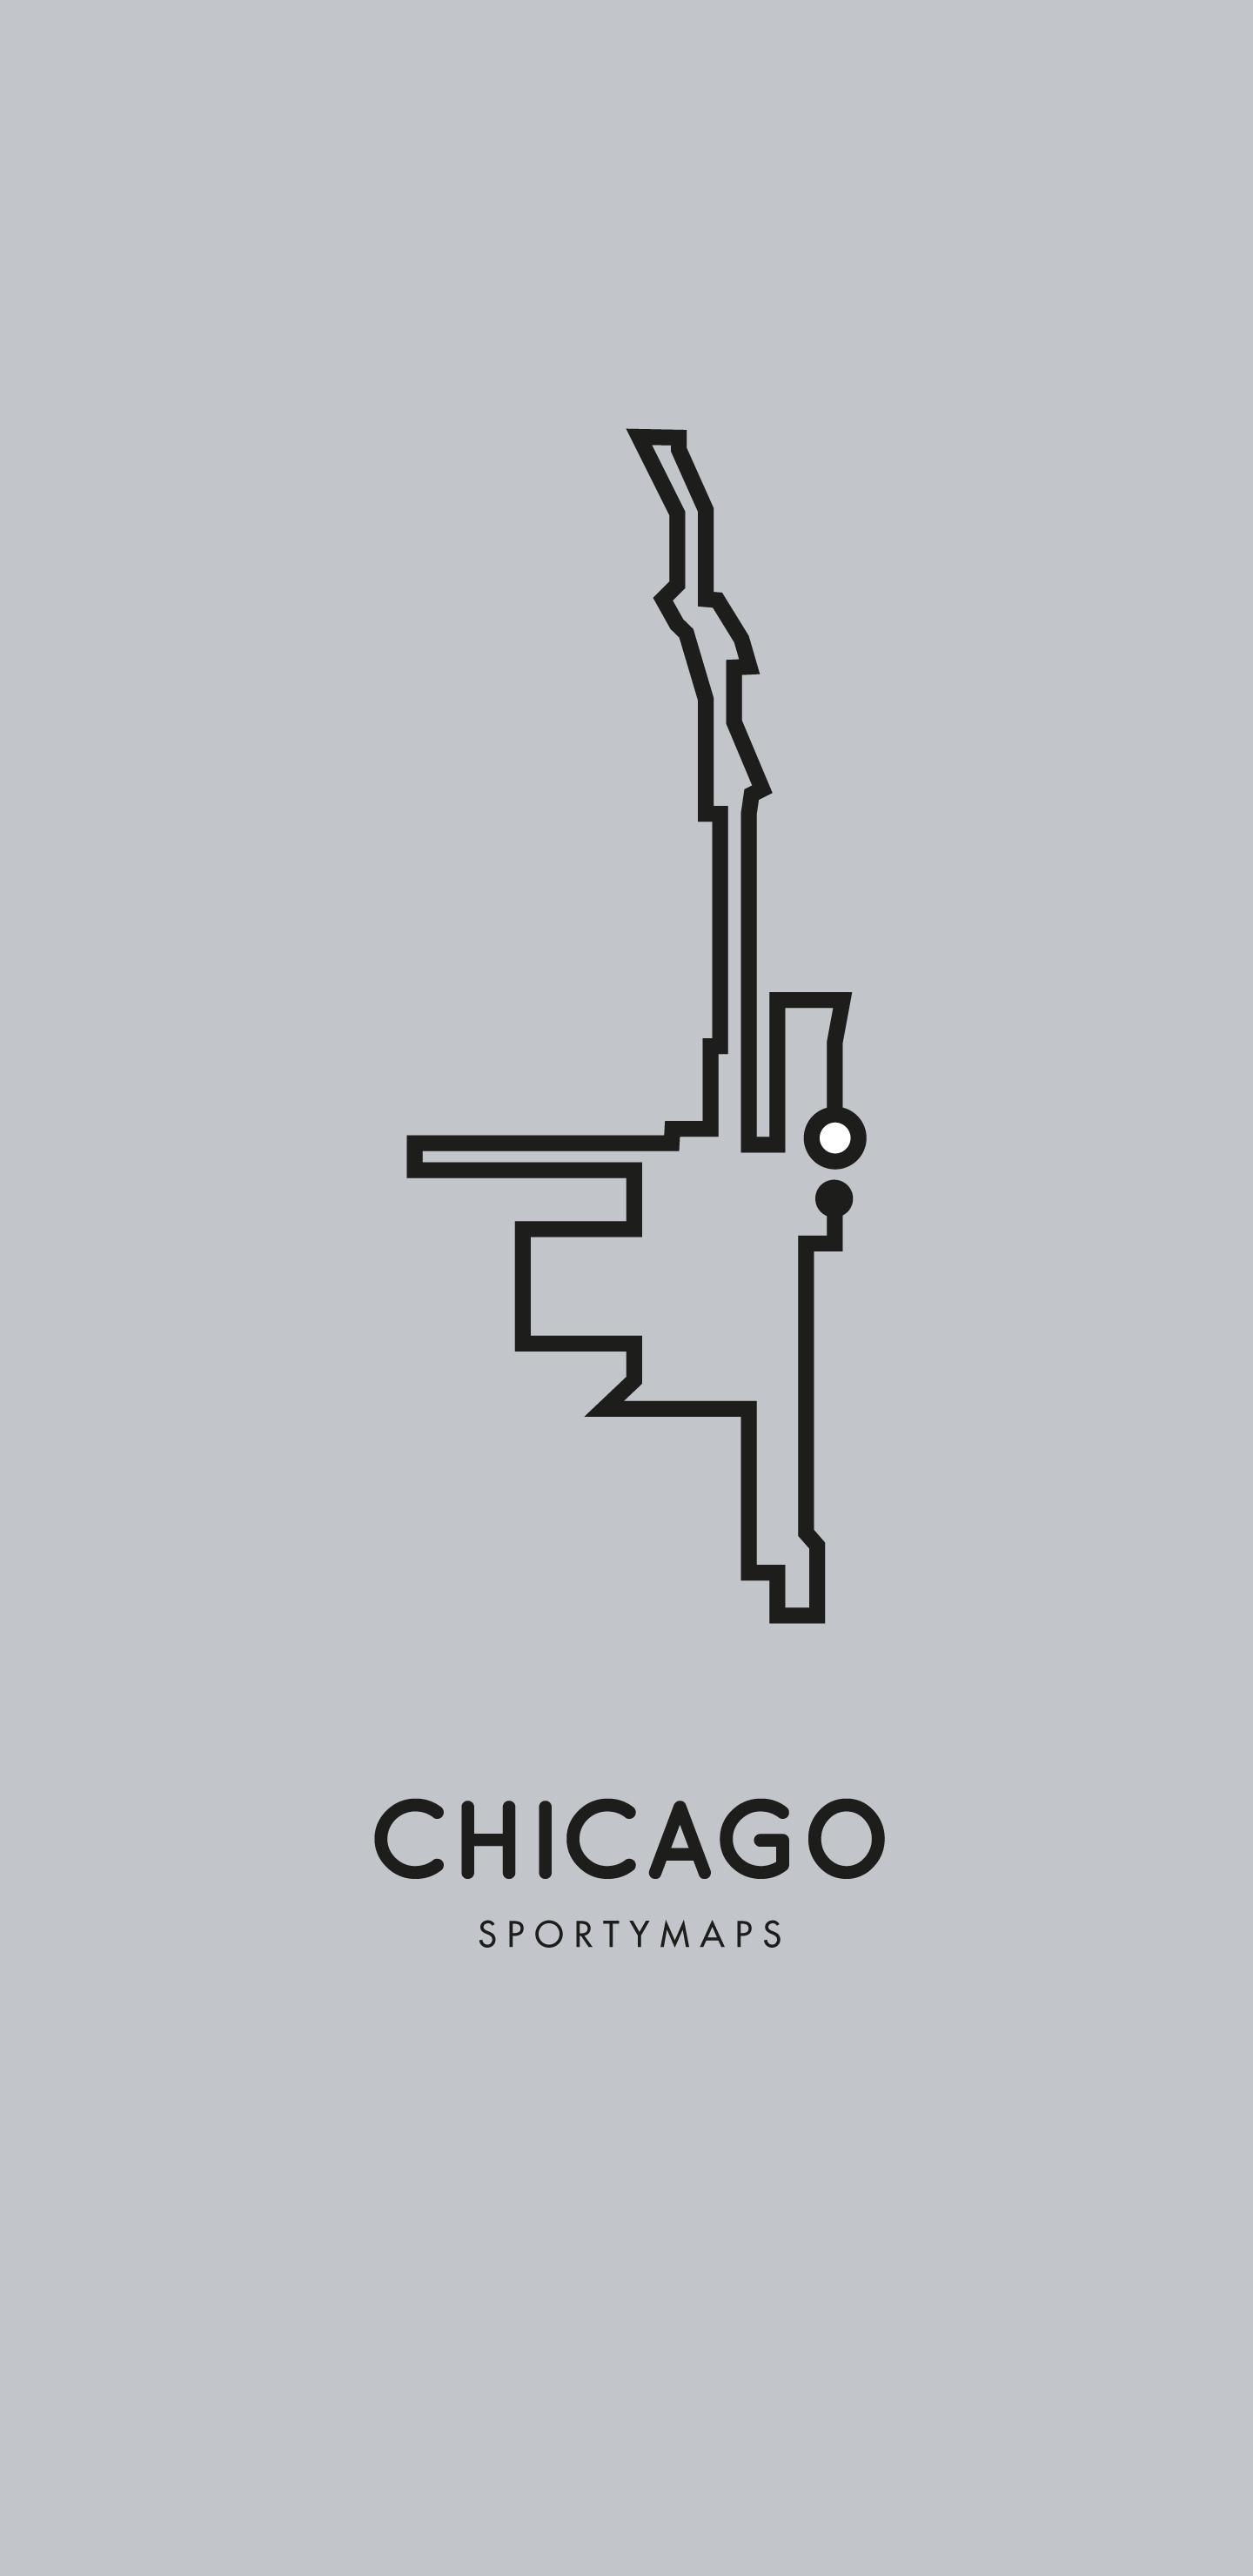 Sportymaps-Chicago-marathon-gray